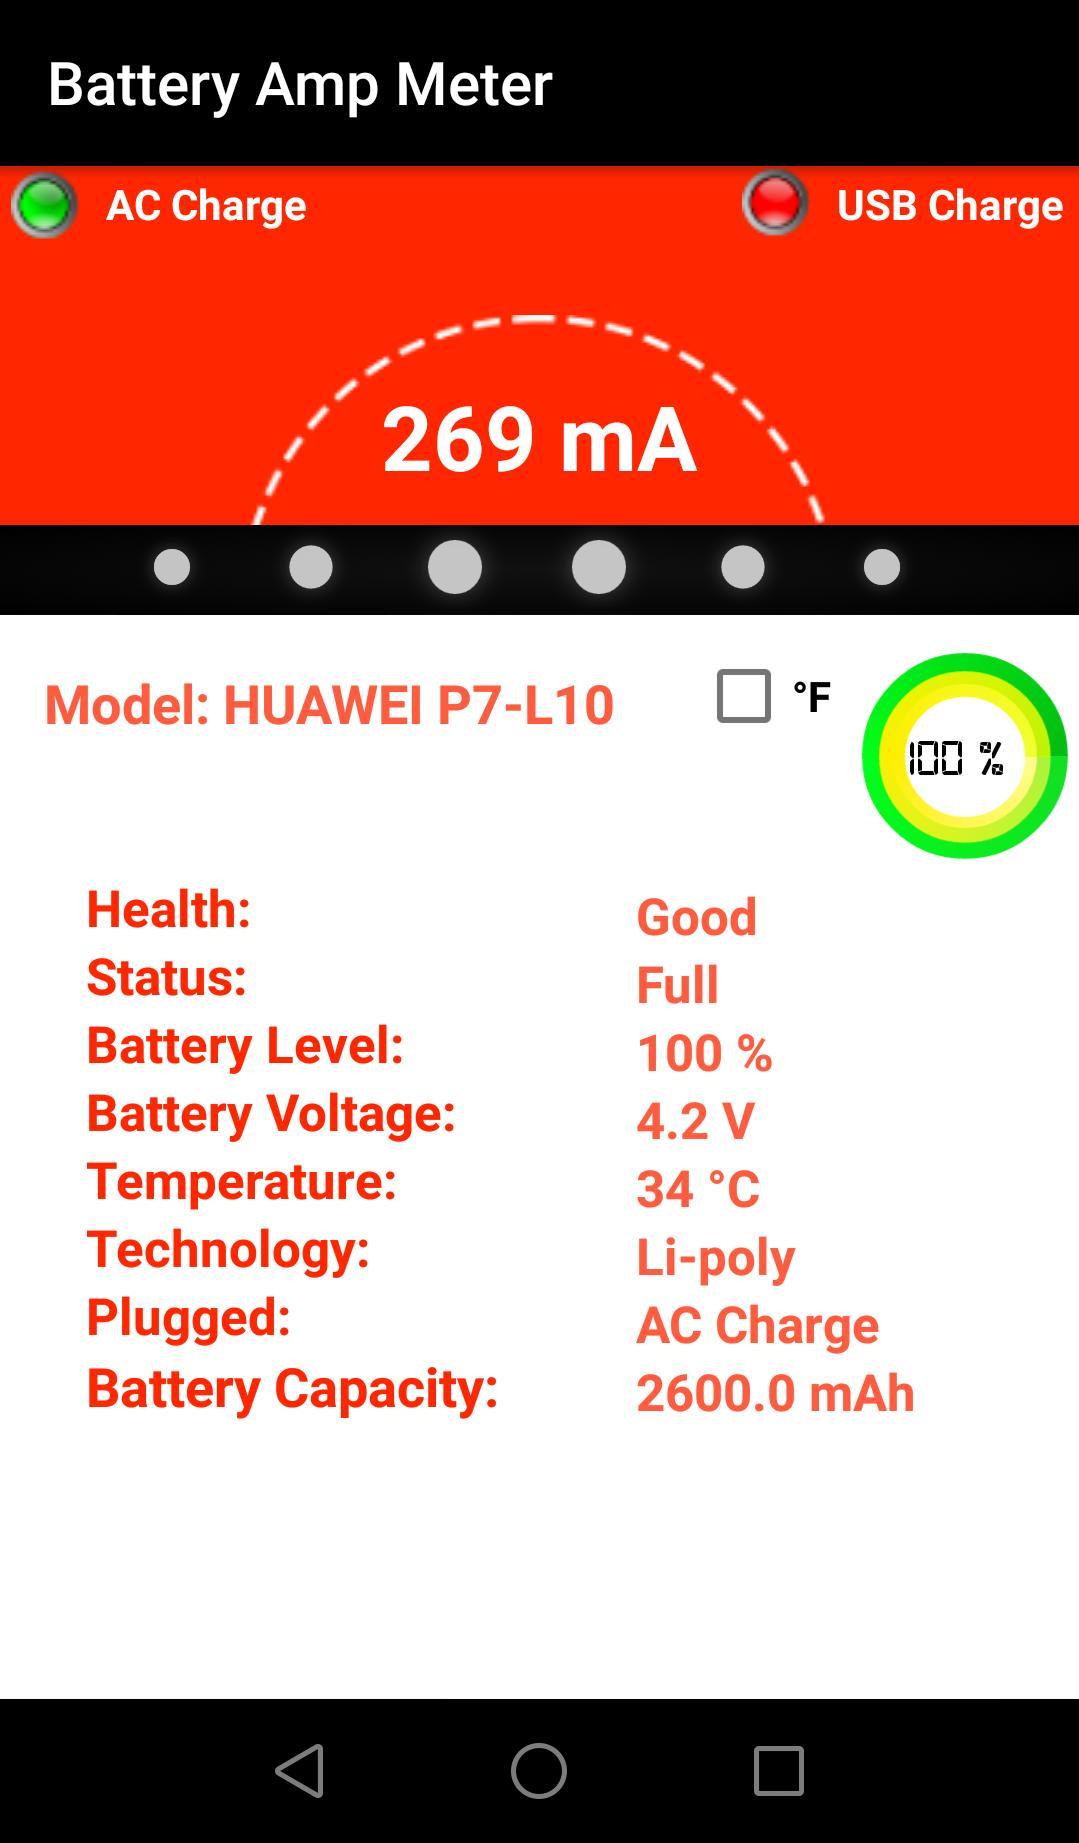 Battery Smart Meter poster